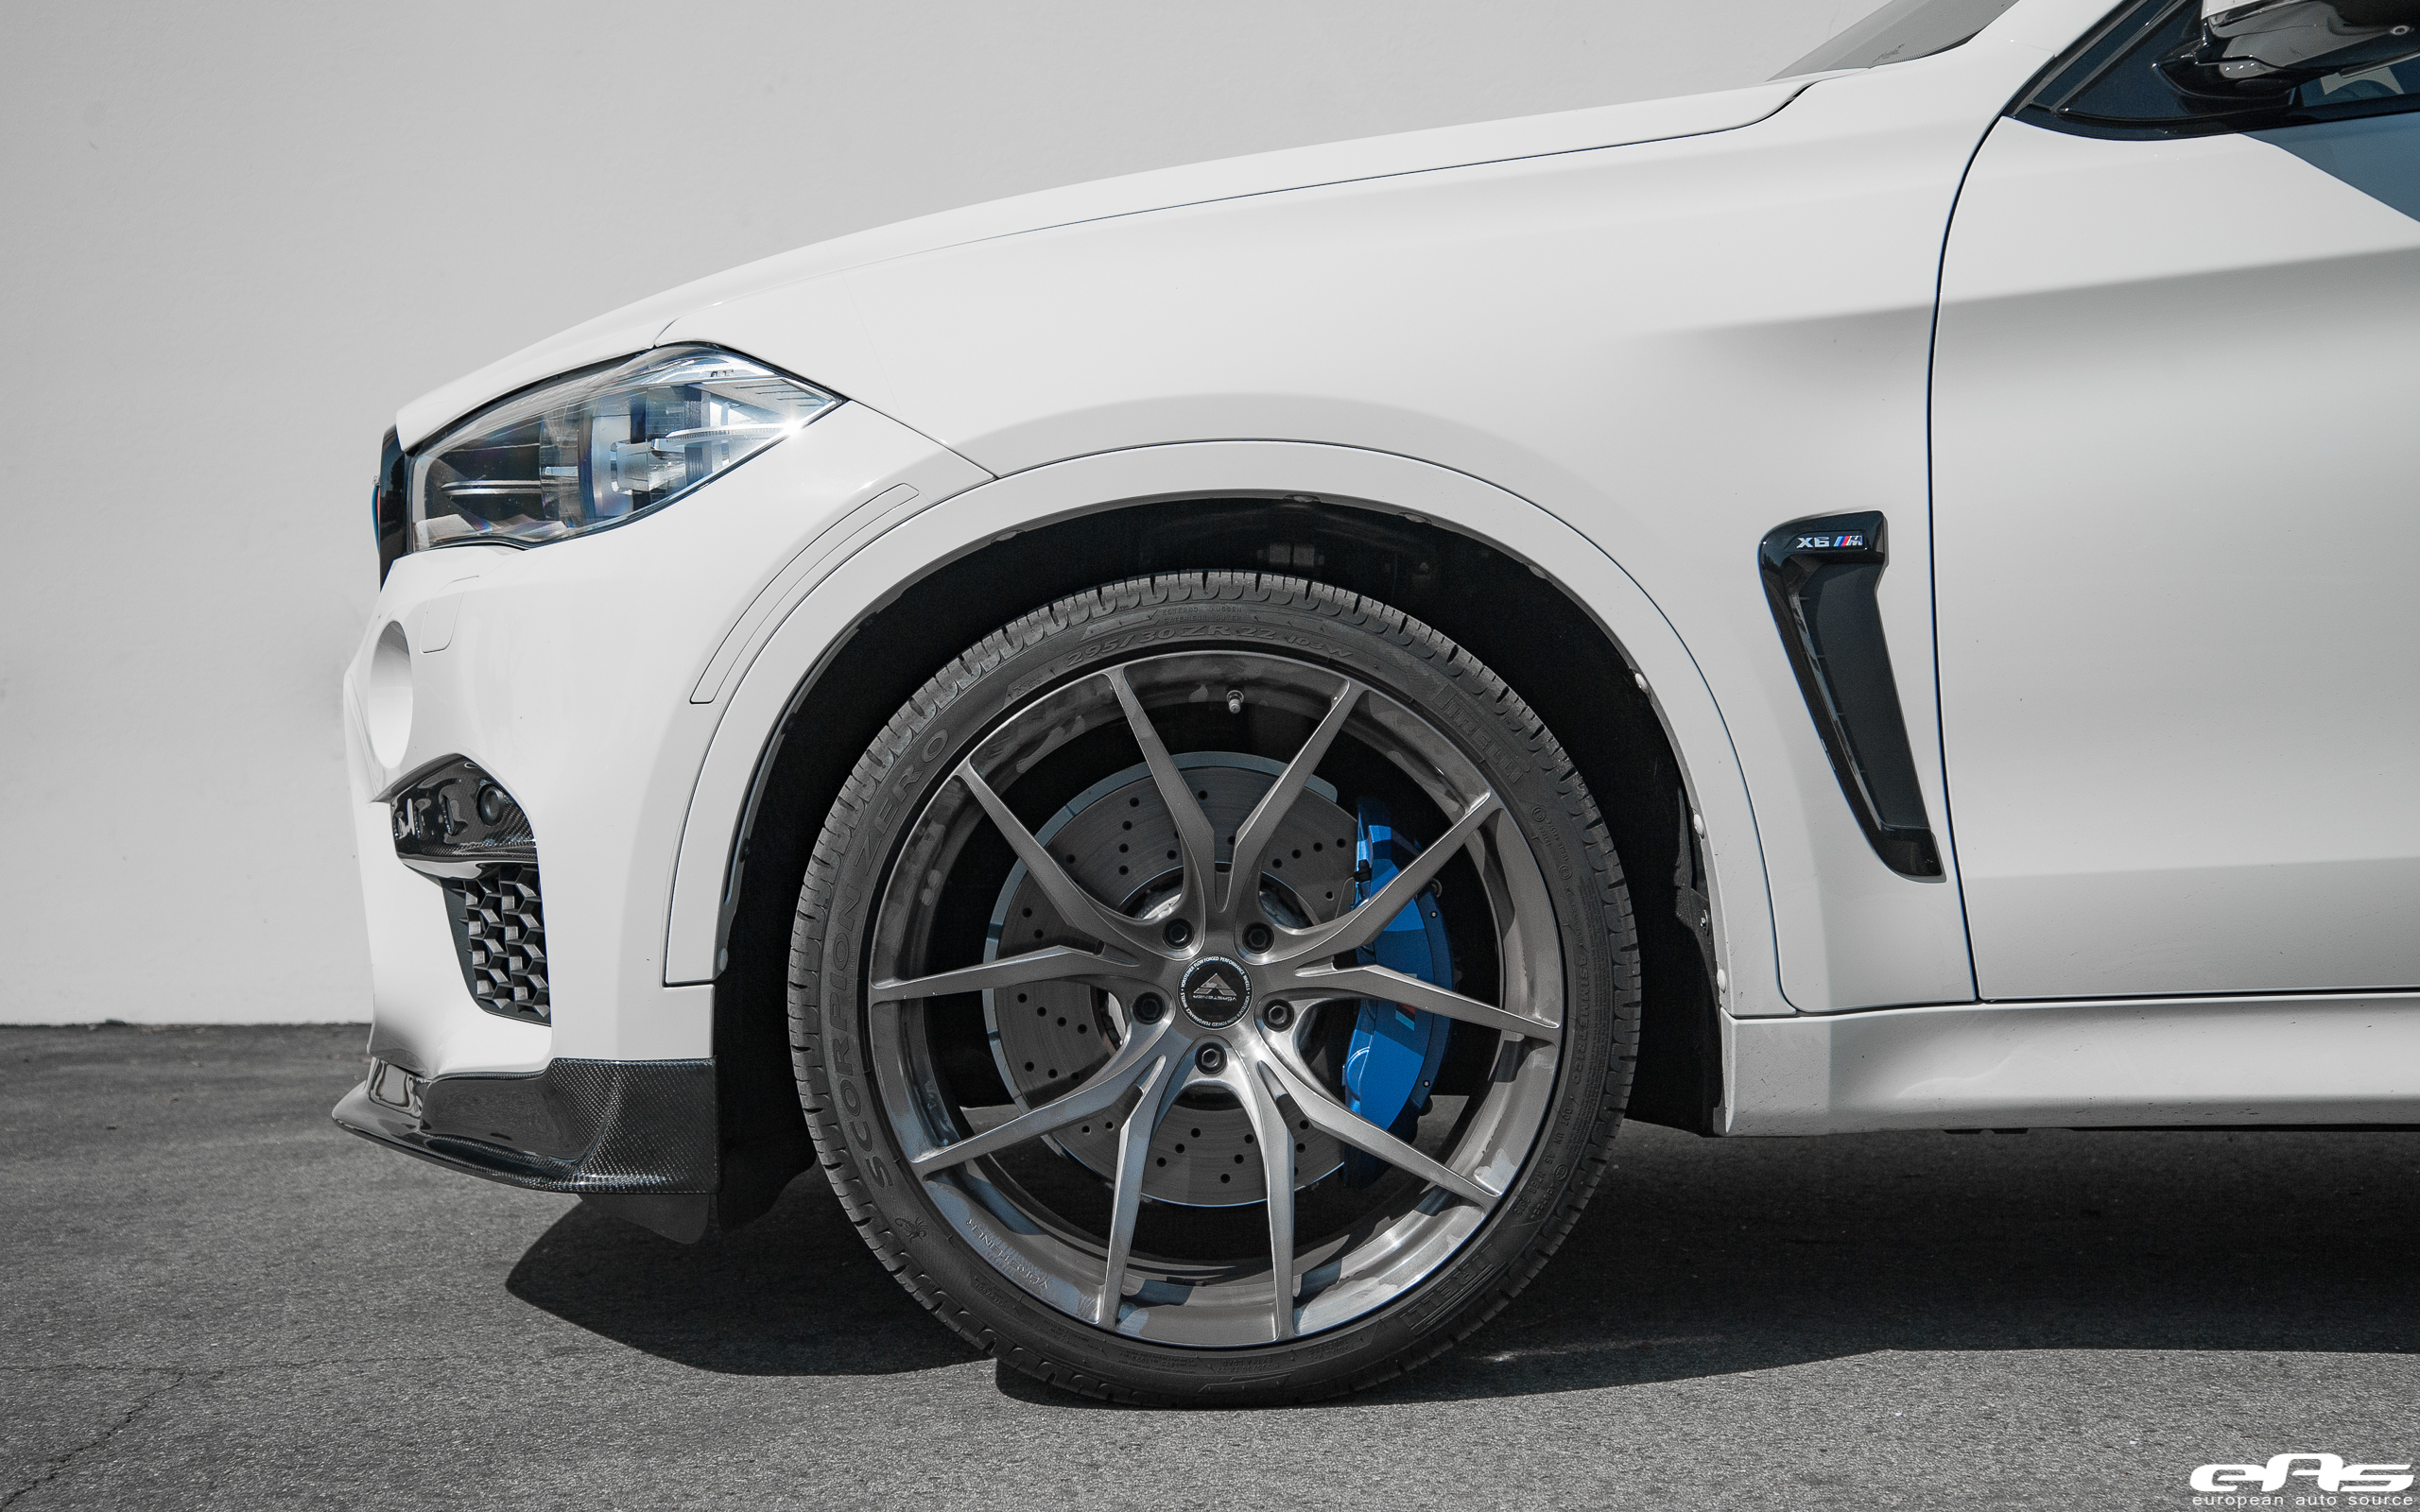 2014 5 bmw x5 m amp x6 m f85 f86 page 5 - Ind M Performance Side Grille Set Ind Painted Trunk Emblem Rkp Carbon Fiber Bumper Inserts Rkp Carbon Fiber Front Lip Spoiler